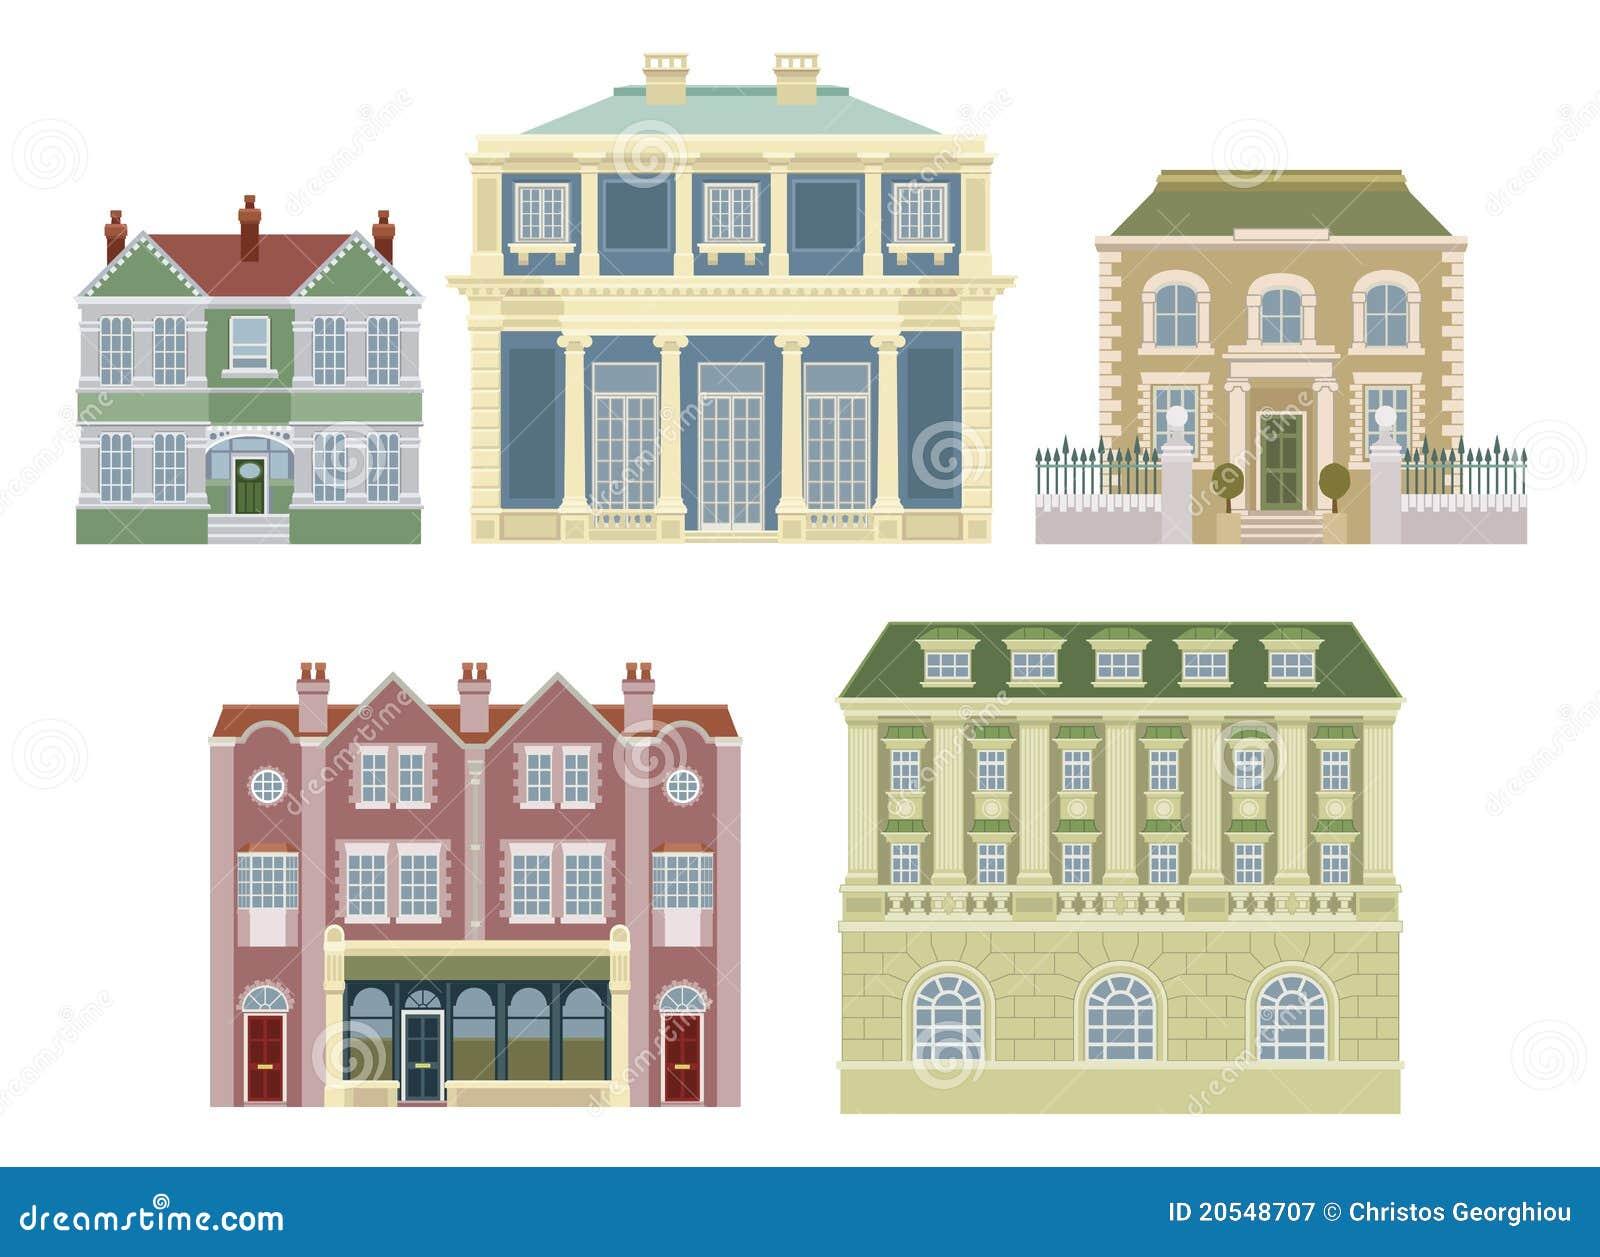 Byggnader danad gammal huslyx